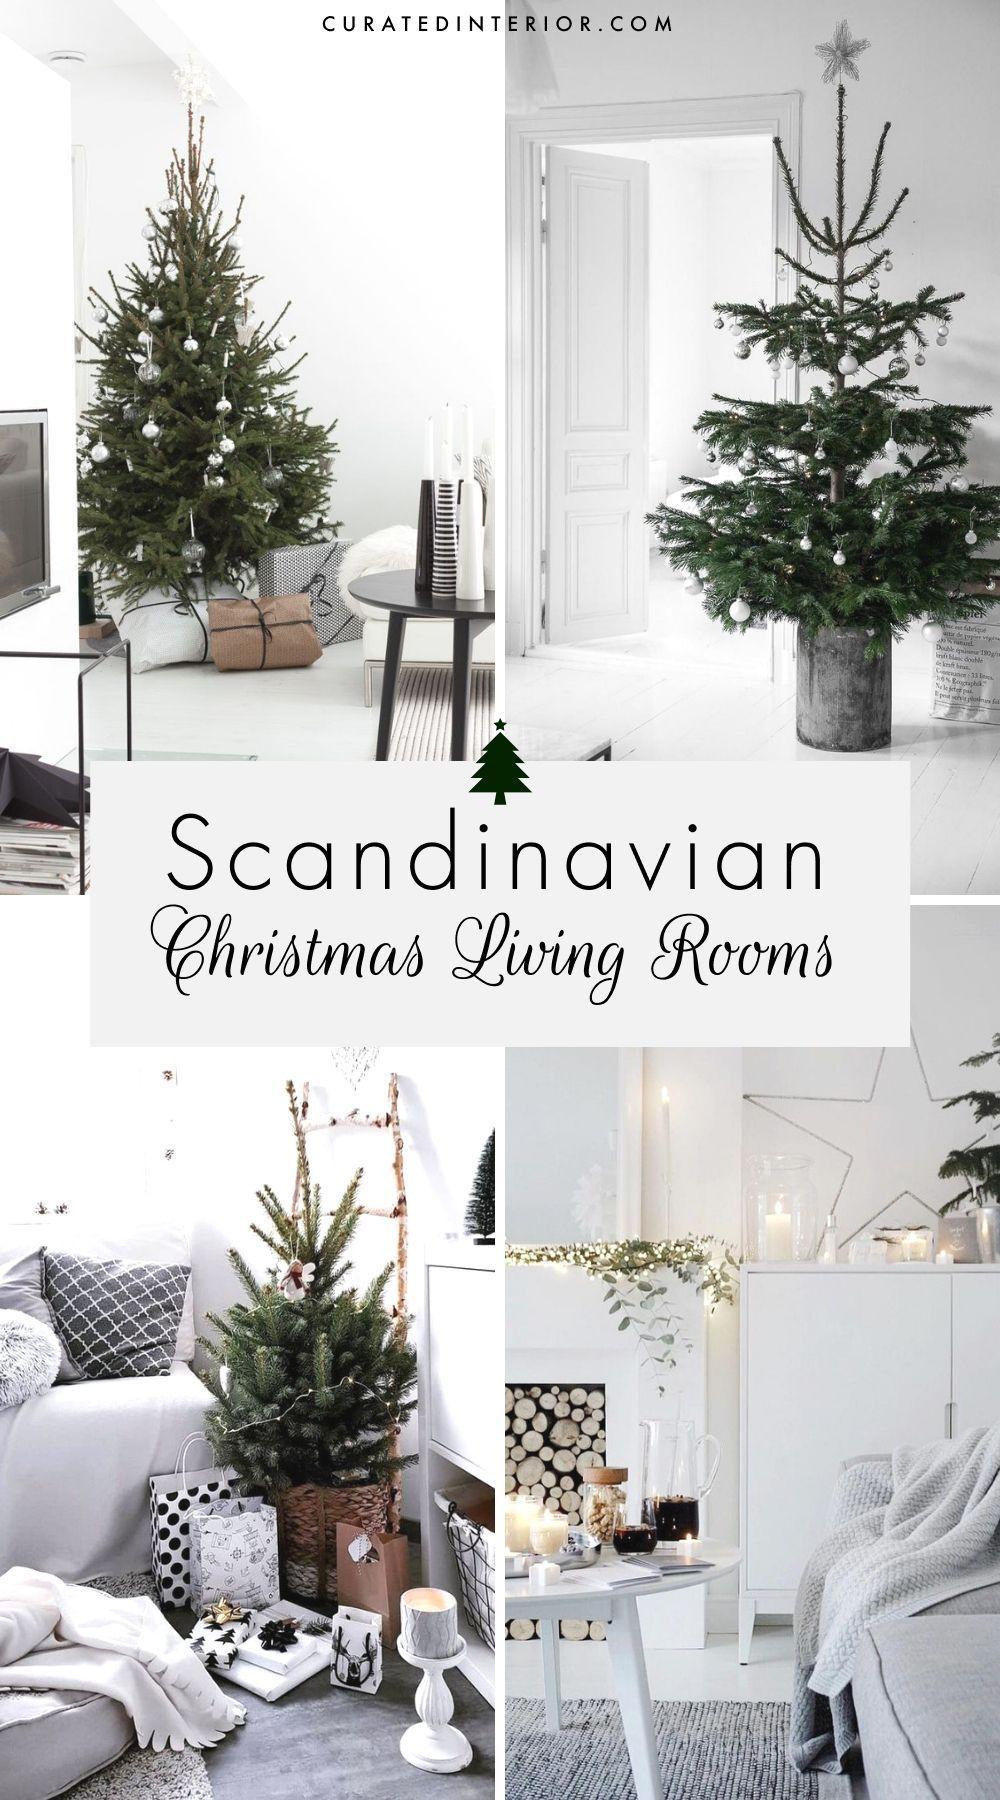 Scandinavian Christmas Living Rooms These Nordic Christmas Living Room Decor Ideas Will Inspir In 2020 Christmas Living Rooms Christmas Decorations Living Room Decor